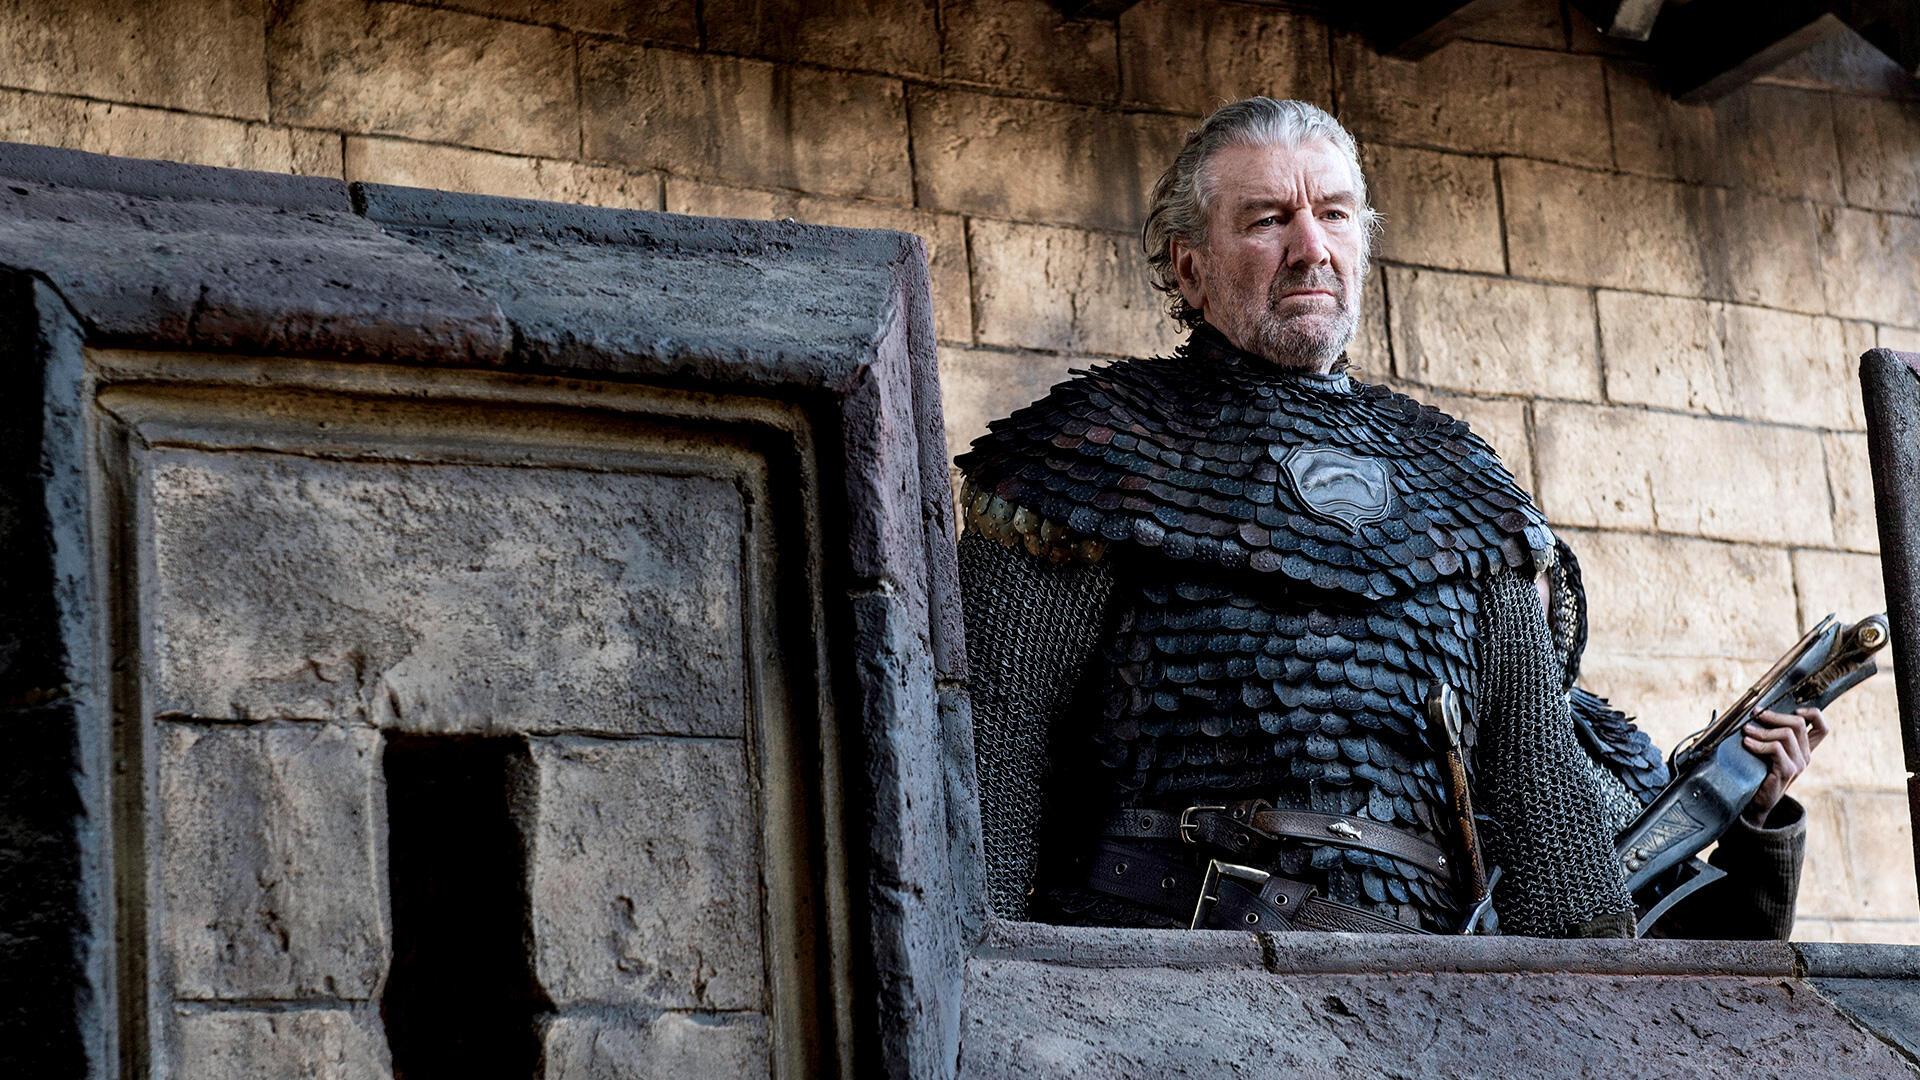 Game Of Thrones Staffel 6 Folge 3 Stream